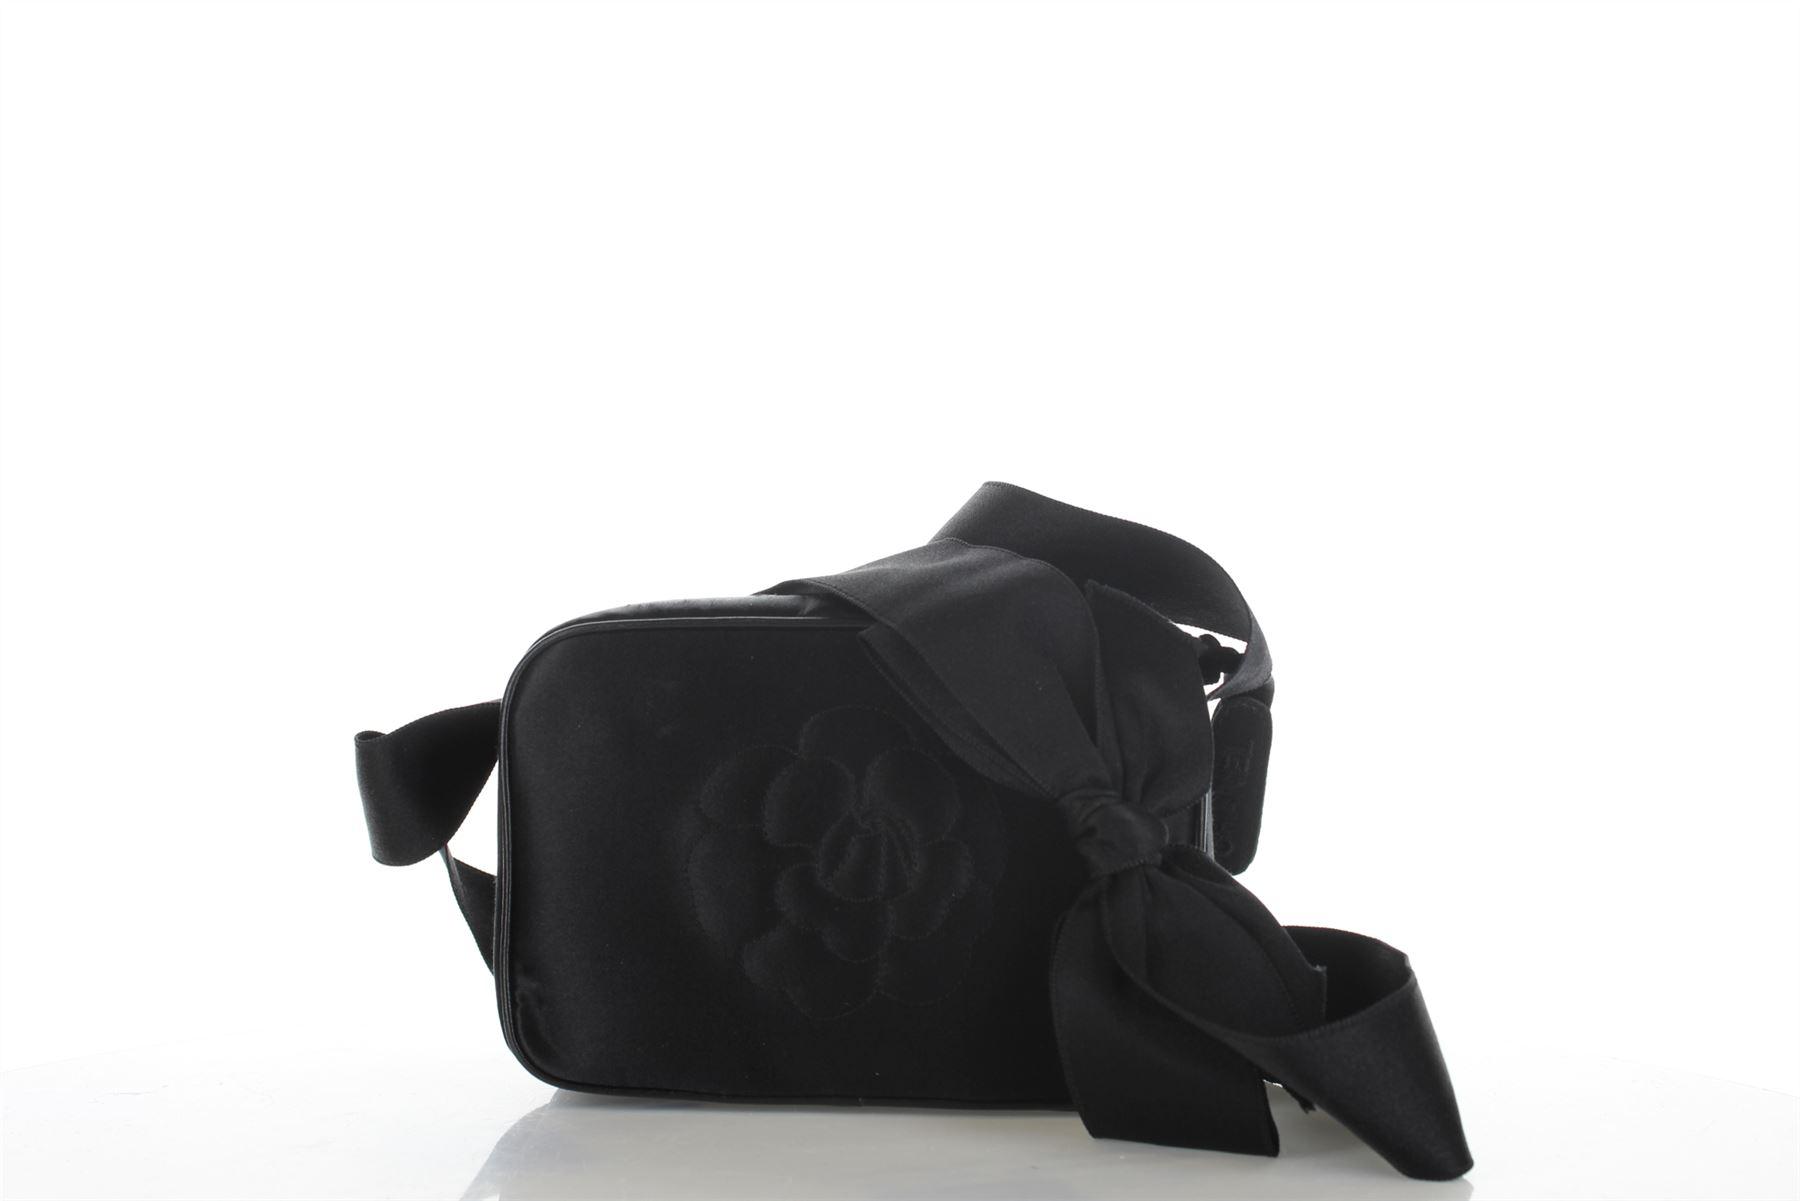 Details about CHANEL Bow Camellia Black Satin Crossbody Bag 480f7ffd6b954